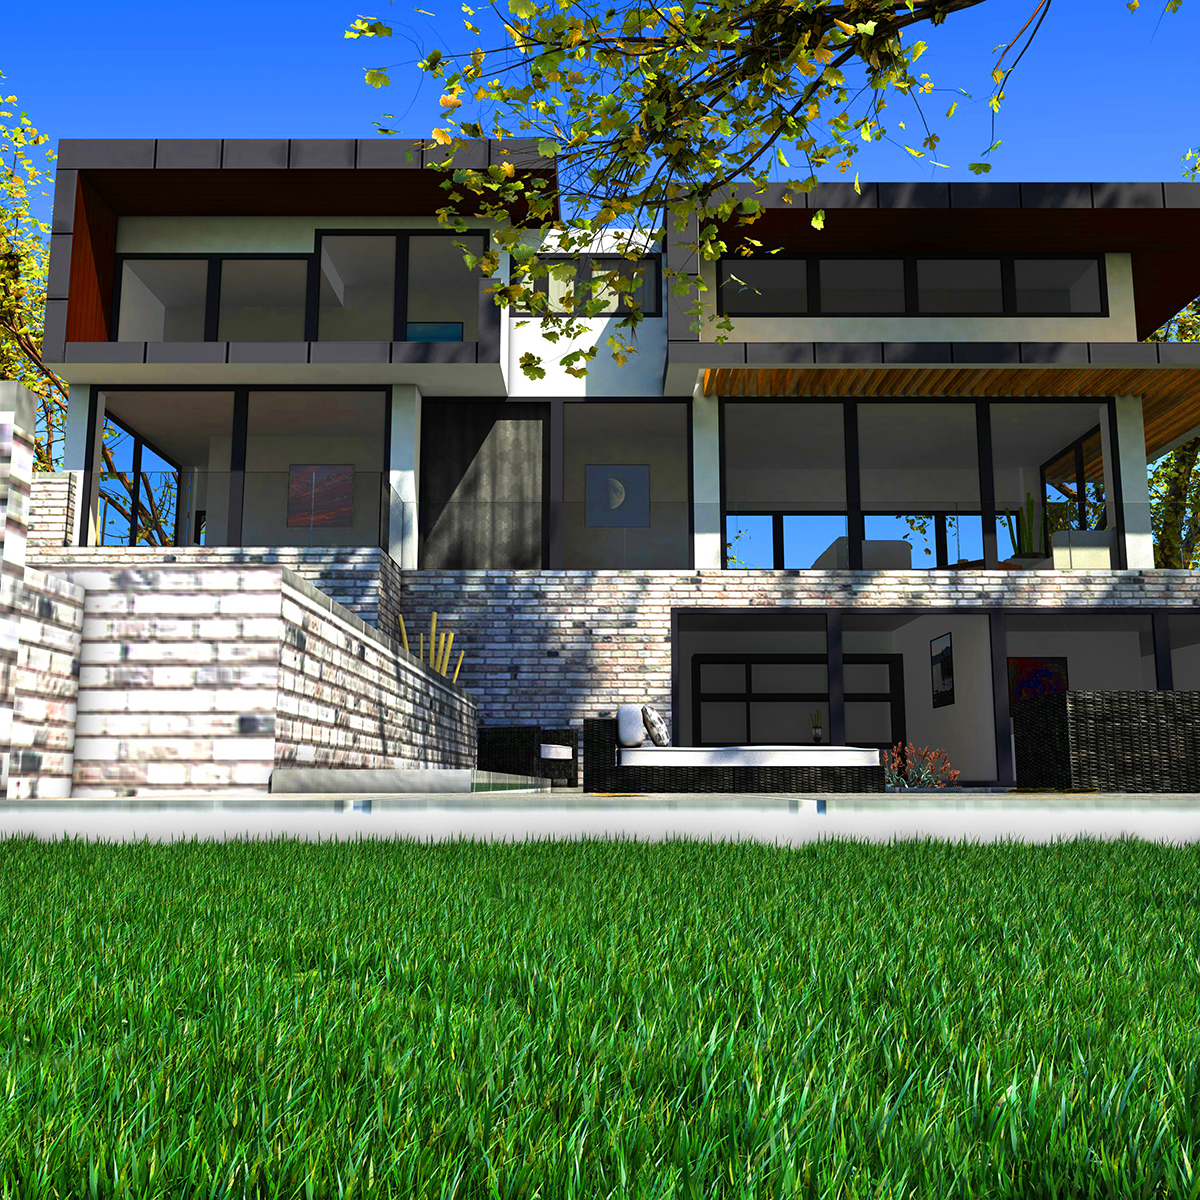 luxurious house 3d model fbx c4d ma mb other obj 164601